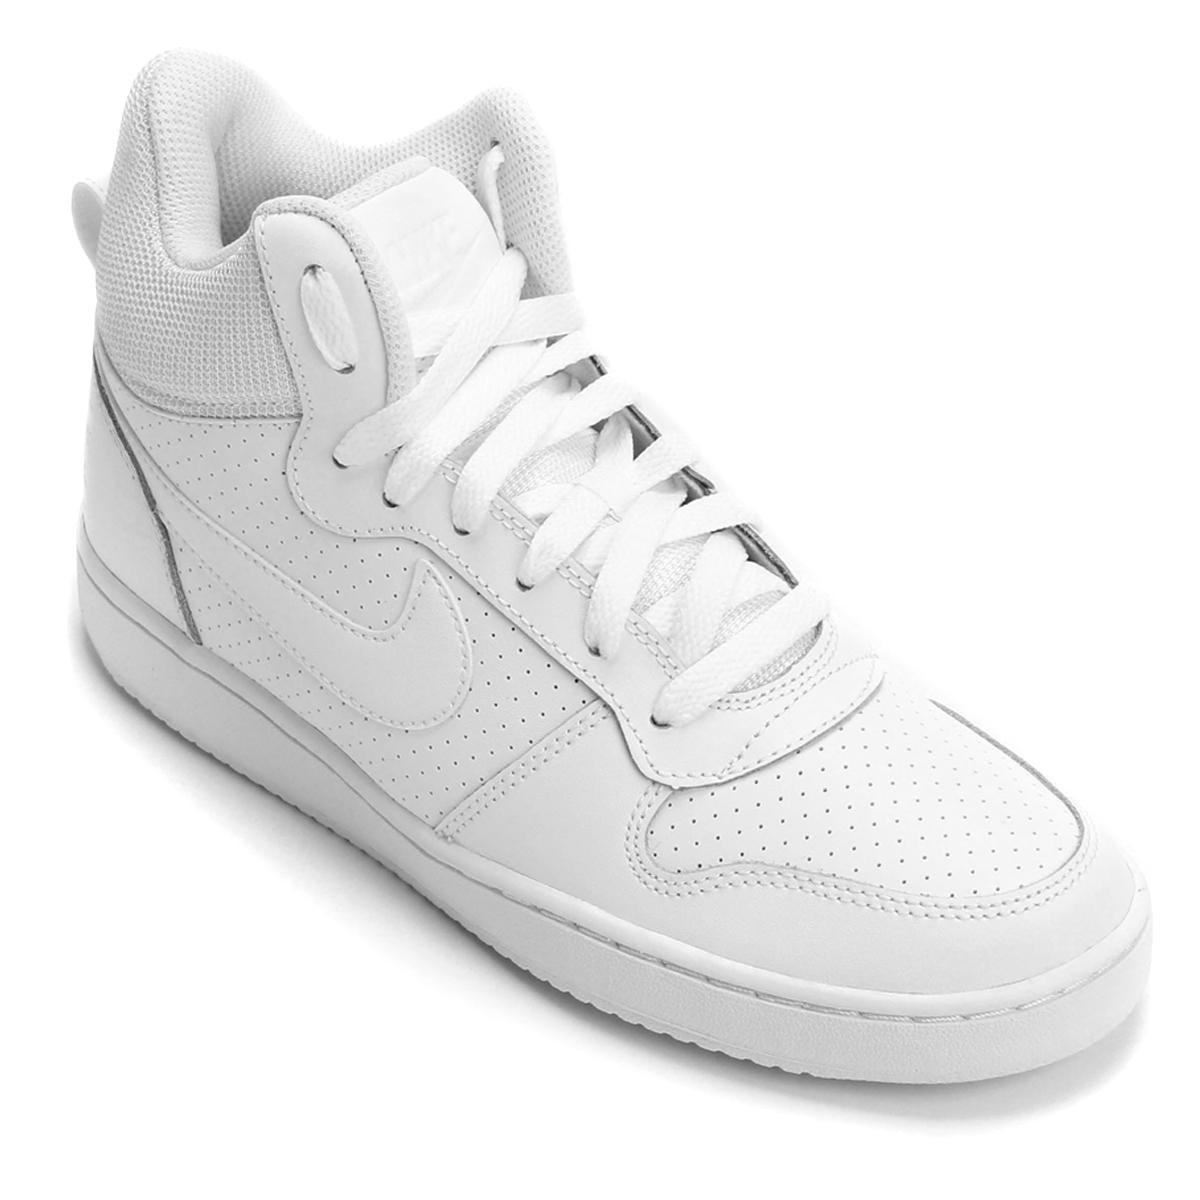 84c1de67ac7 Tênis Couro Cano Alto Nike Recreation Mid Feminino - Branco - Compre ...